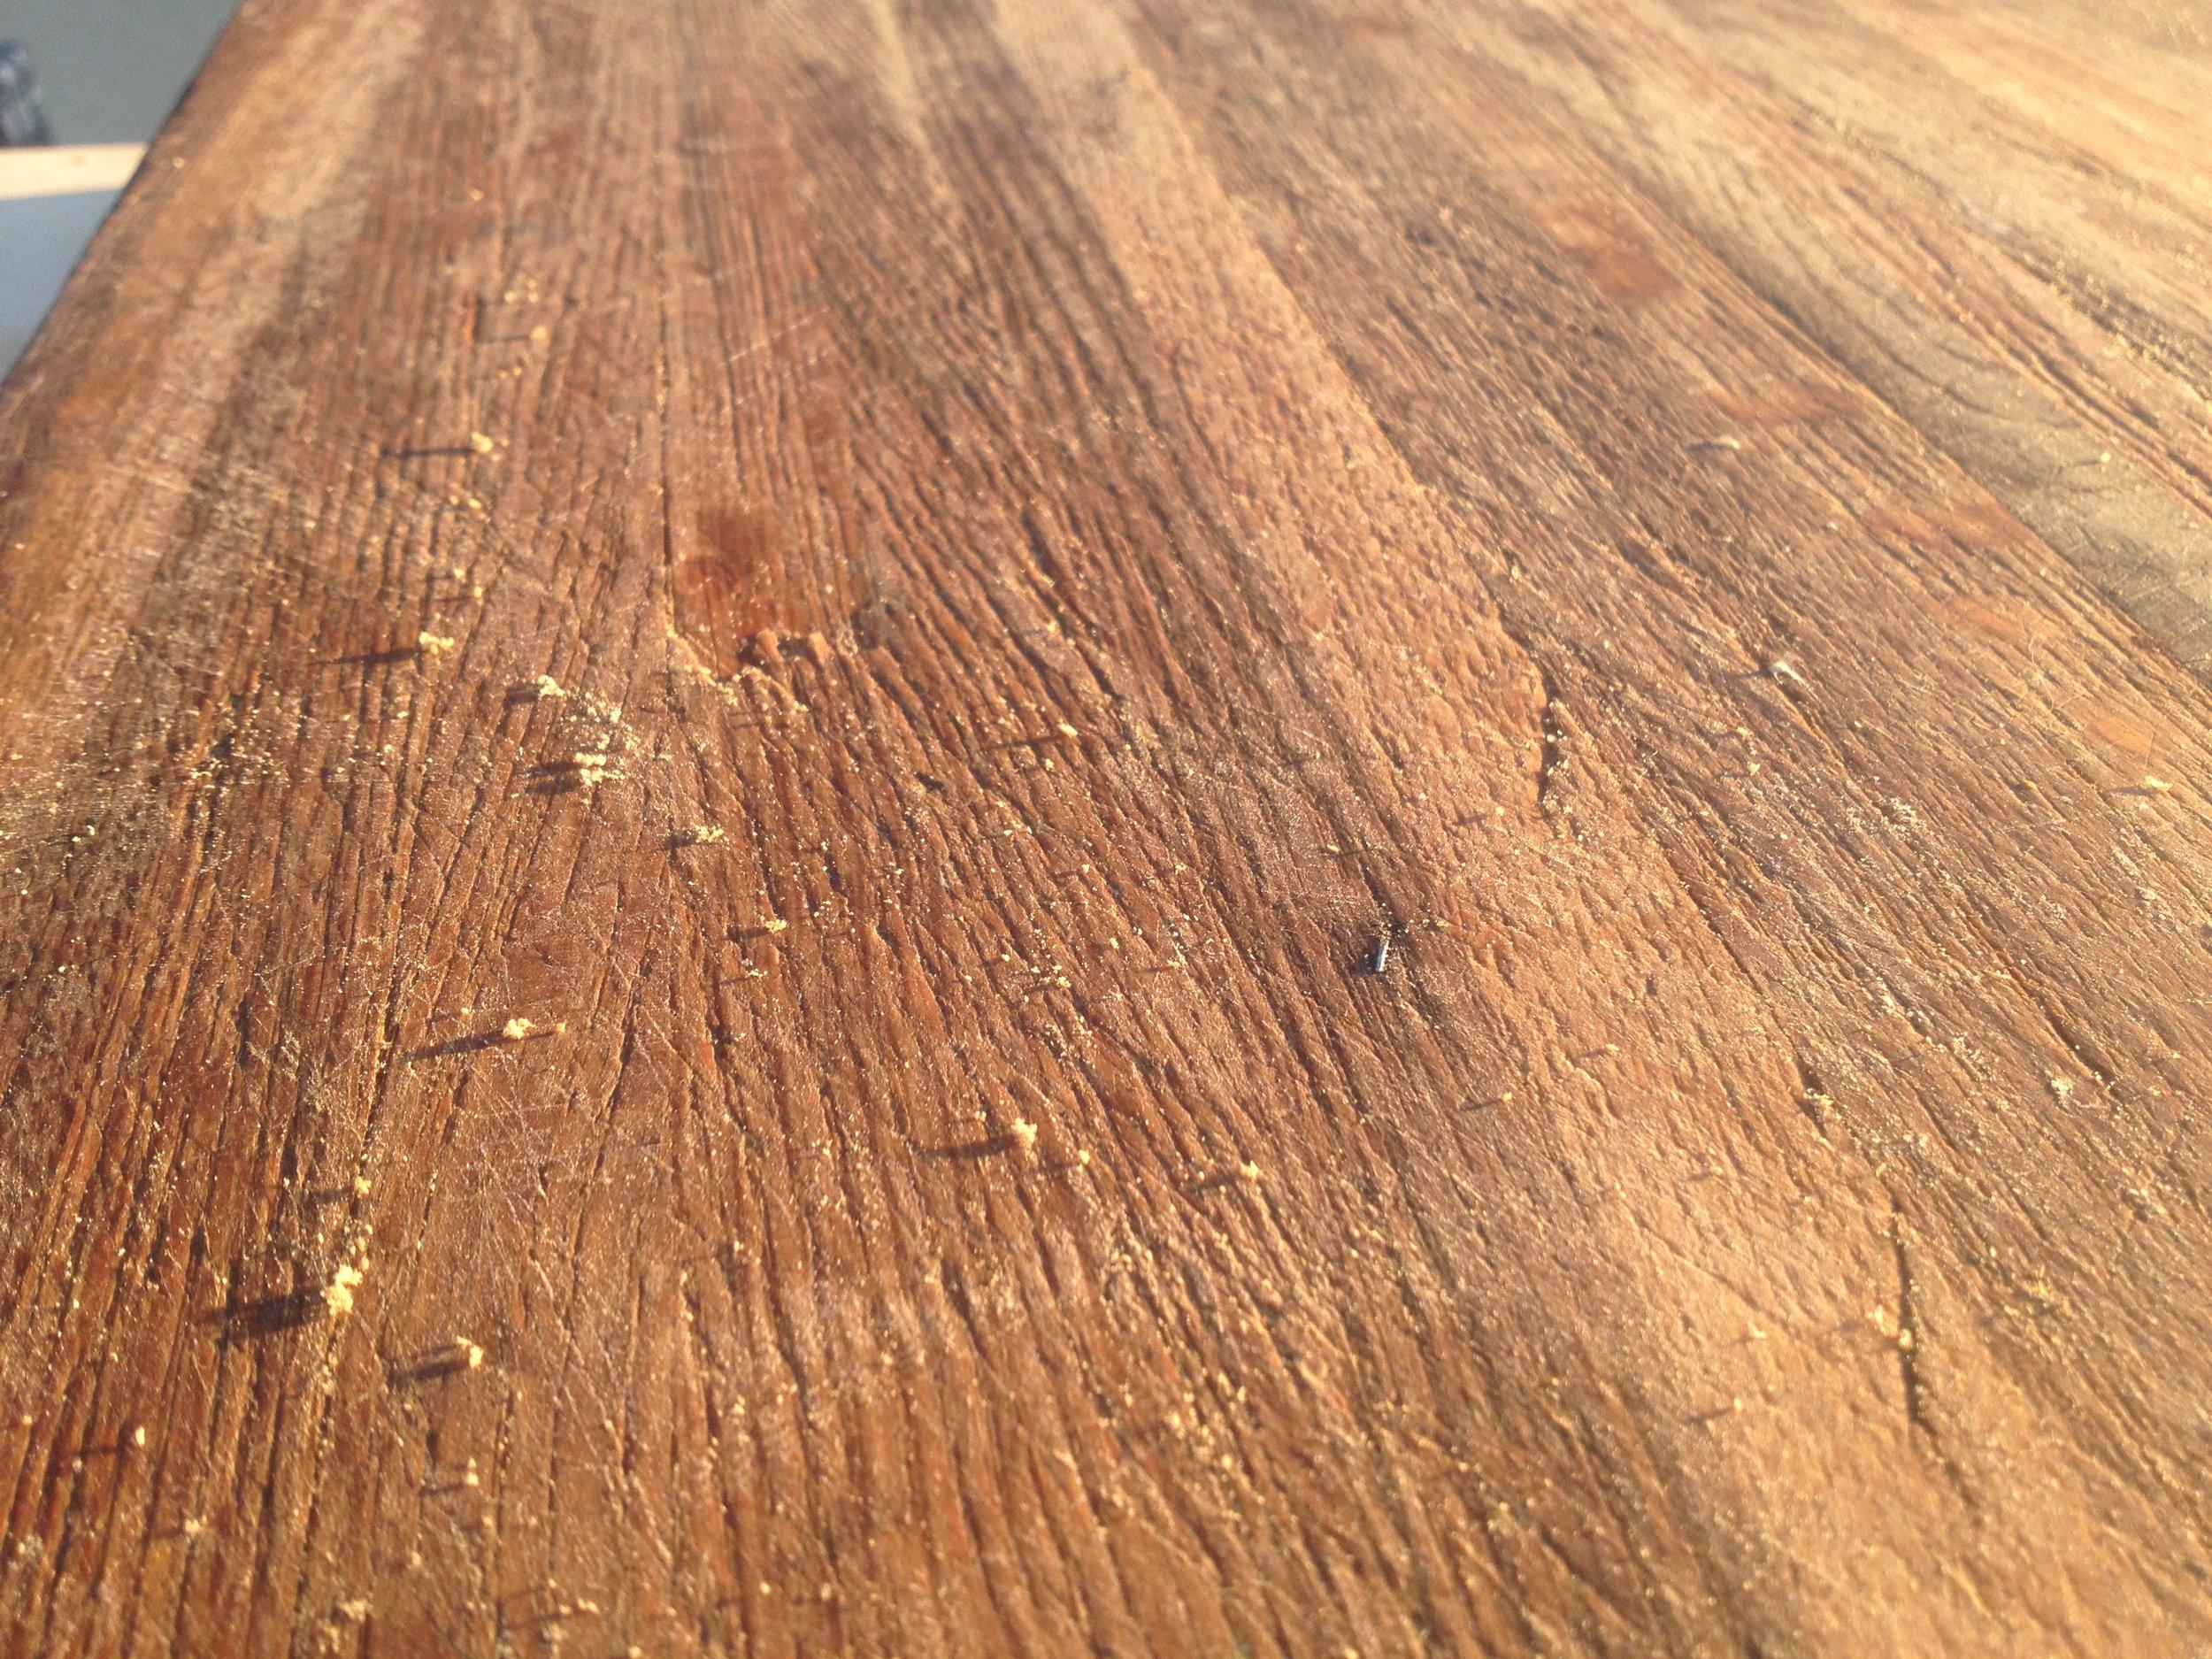 cutting-board-restoration-before-2.jpg